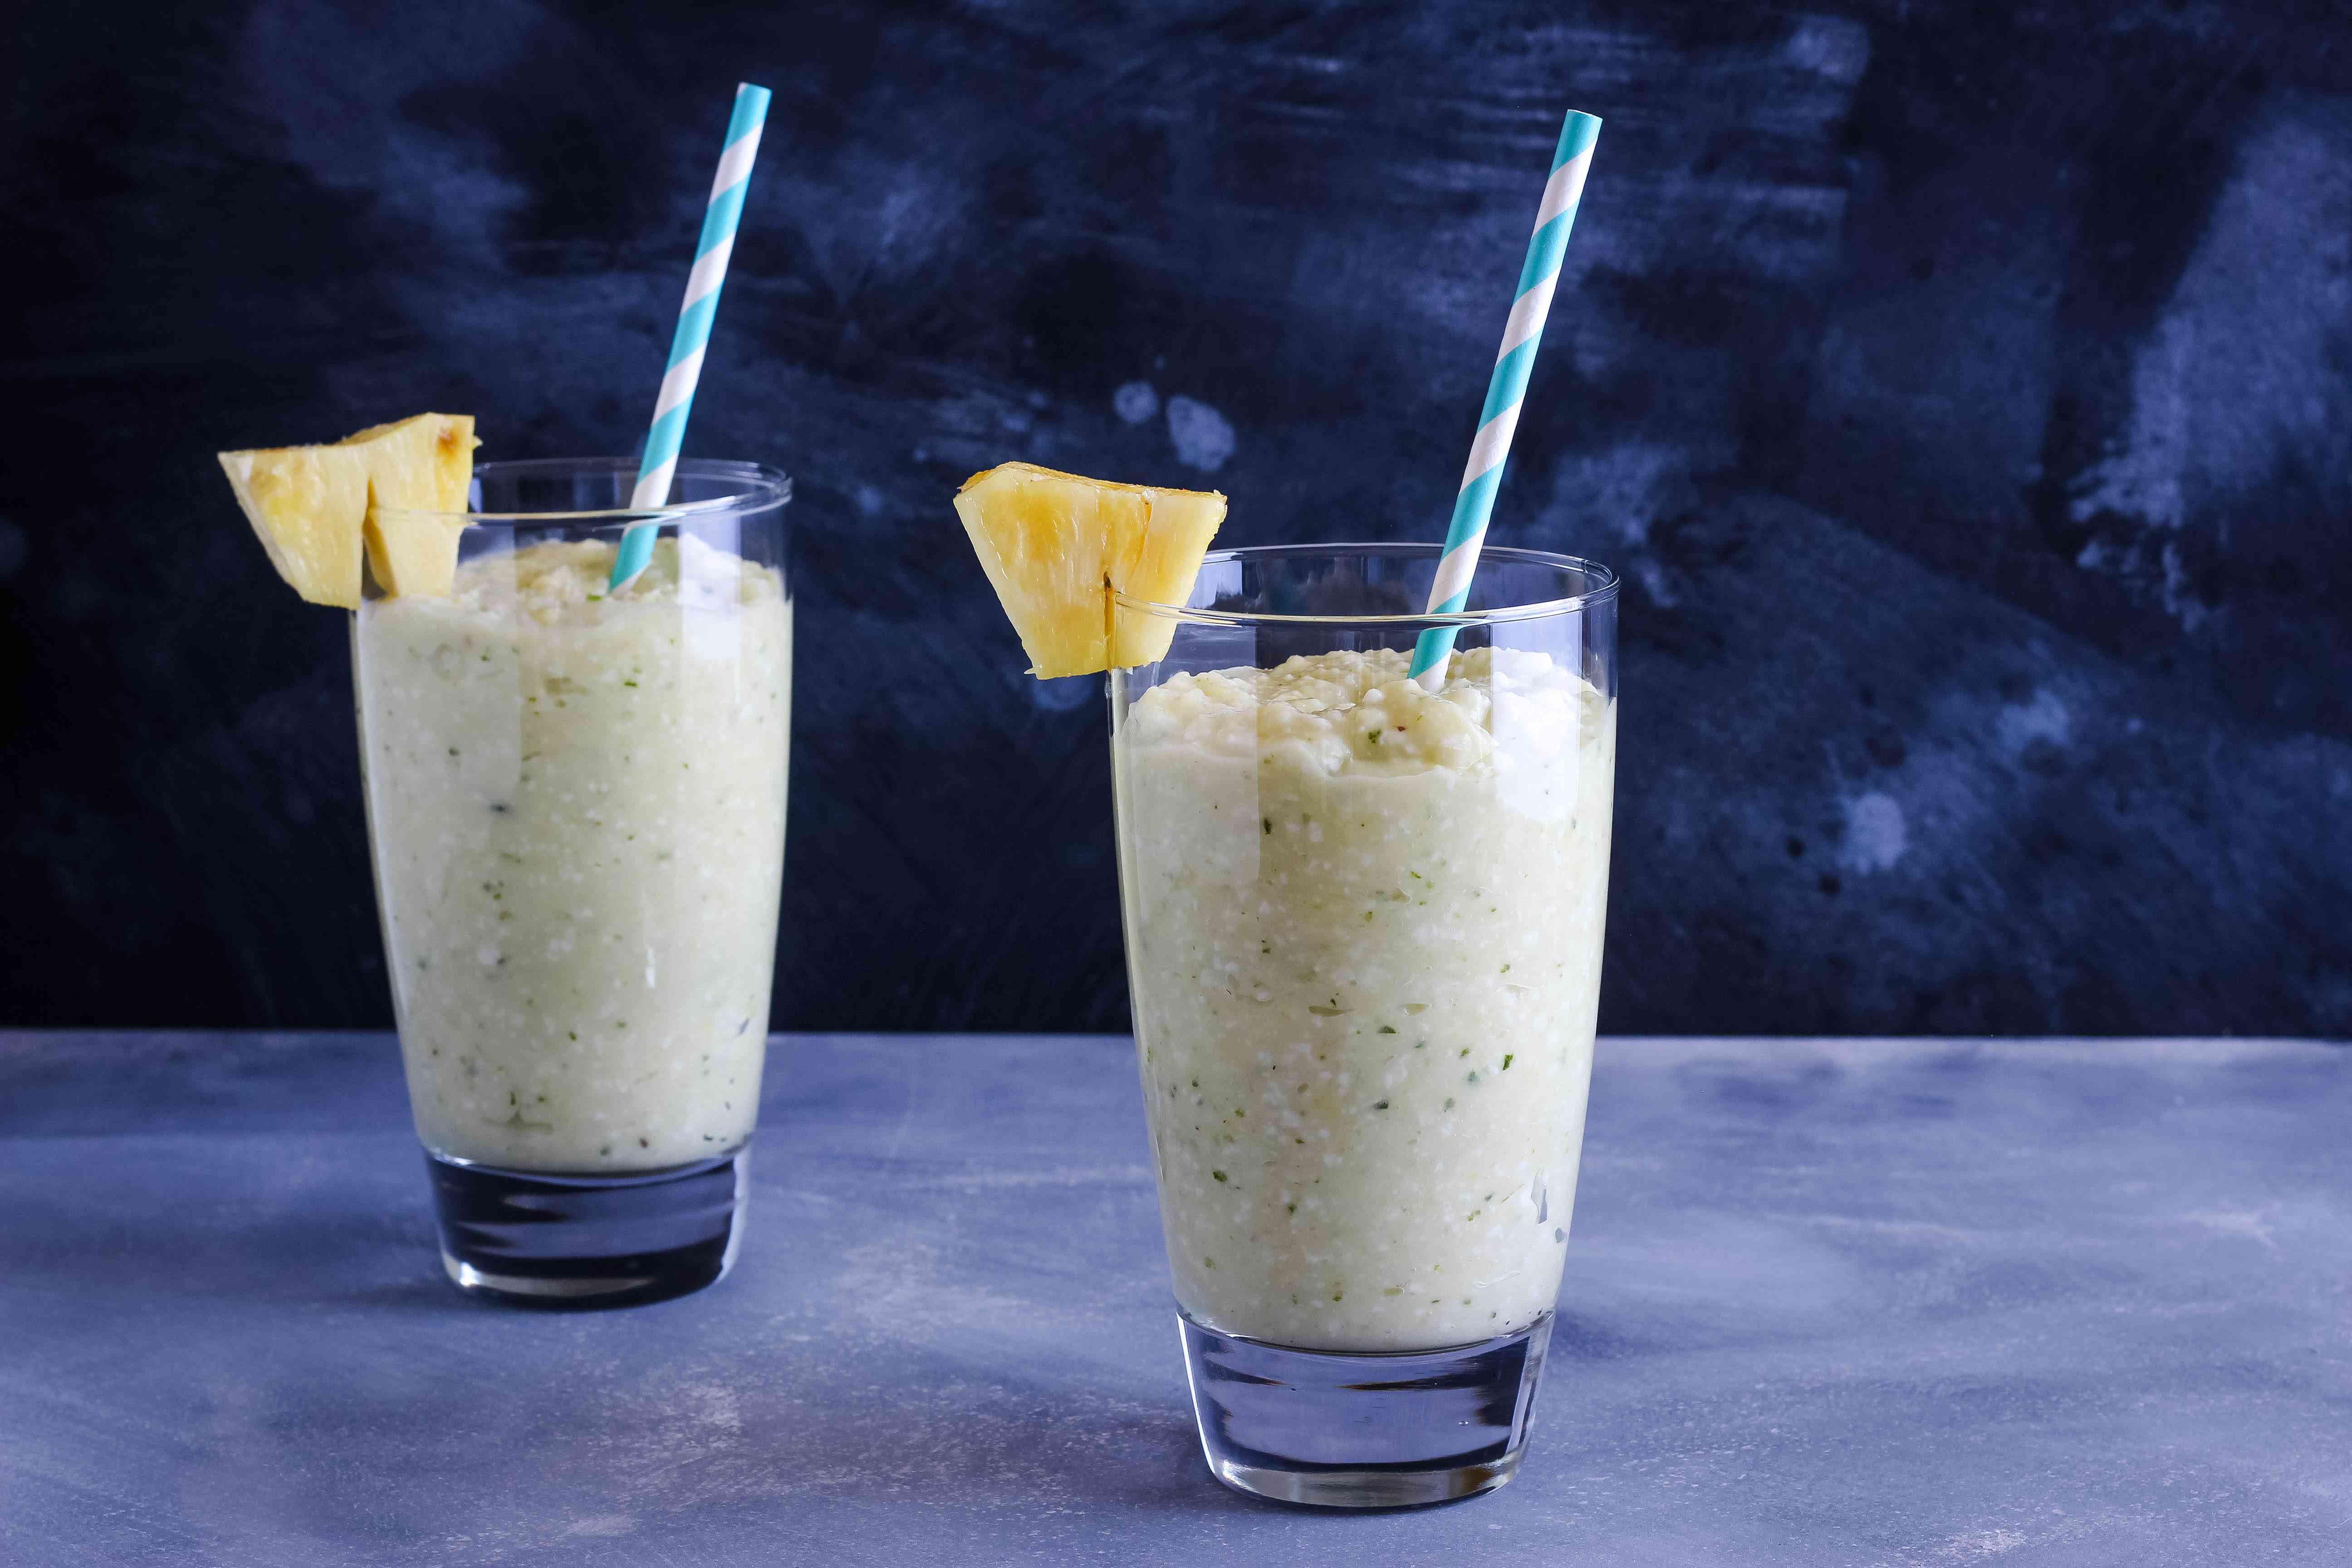 Soursop juice and smoothie recipe